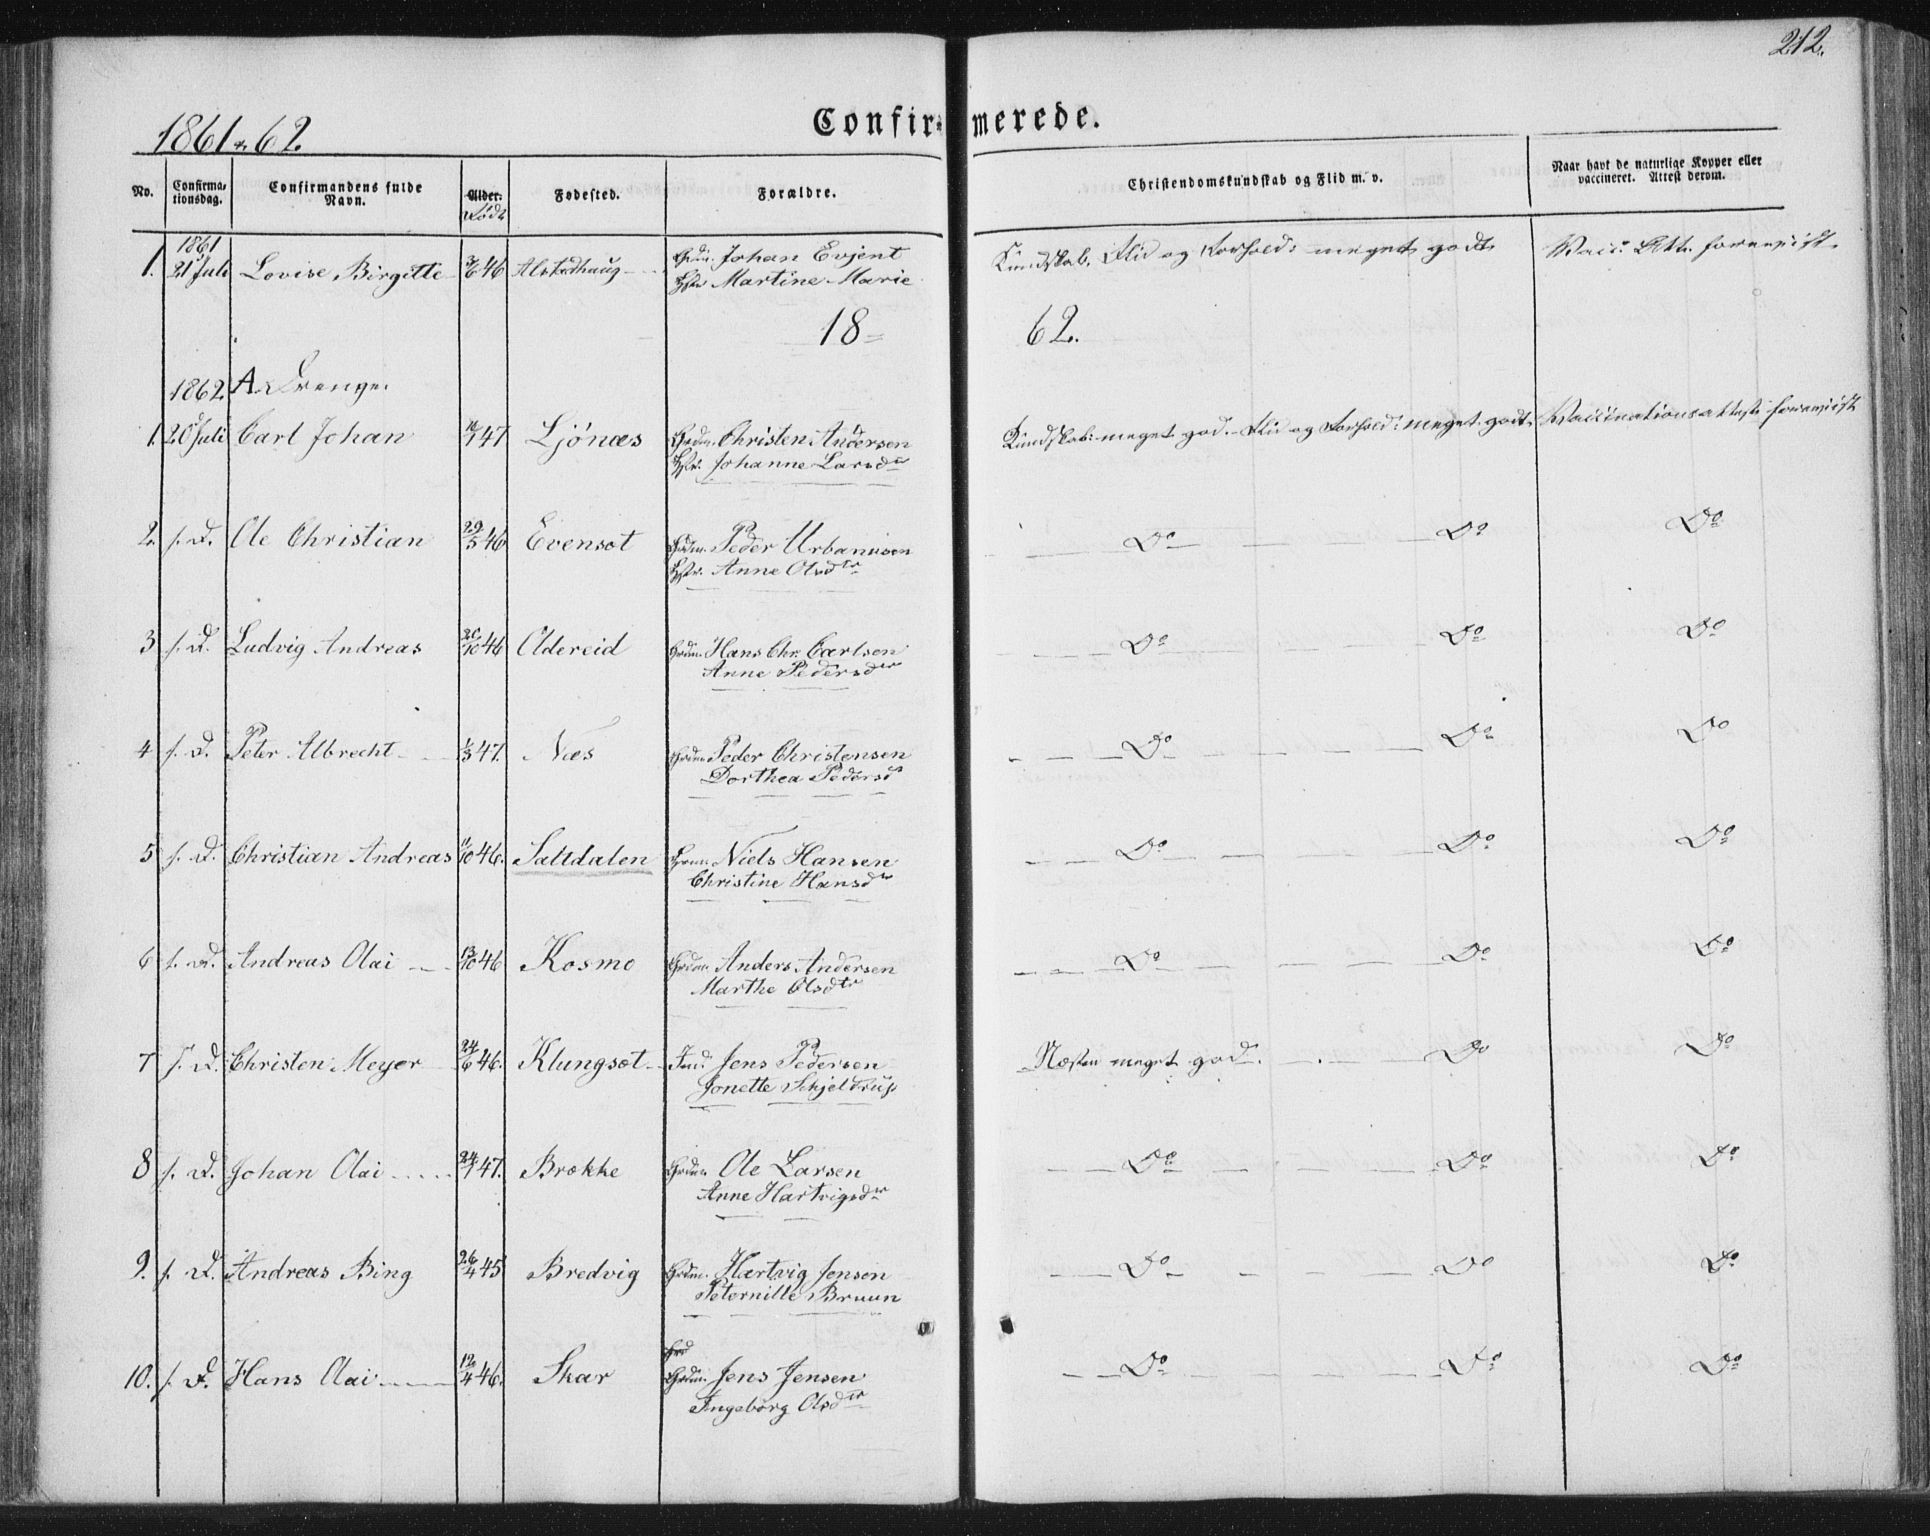 SAT, Ministerialprotokoller, klokkerbøker og fødselsregistre - Nordland, 852/L0738: Ministerialbok nr. 852A08, 1849-1865, s. 212